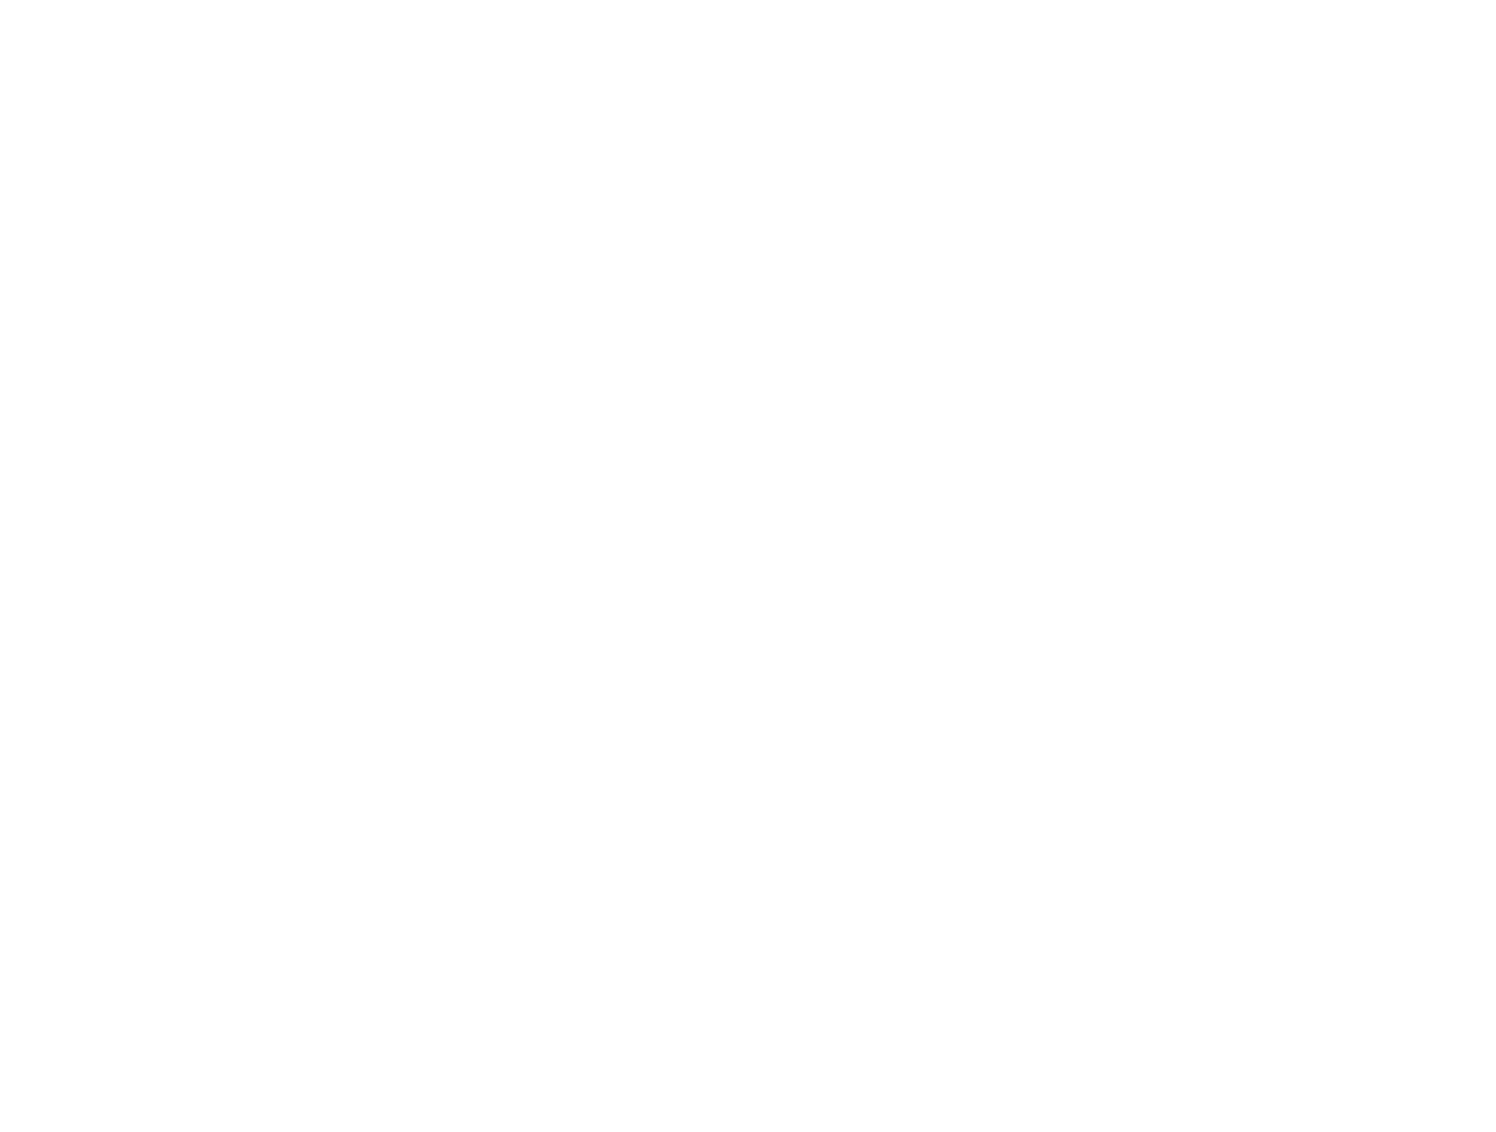 hshp-logo